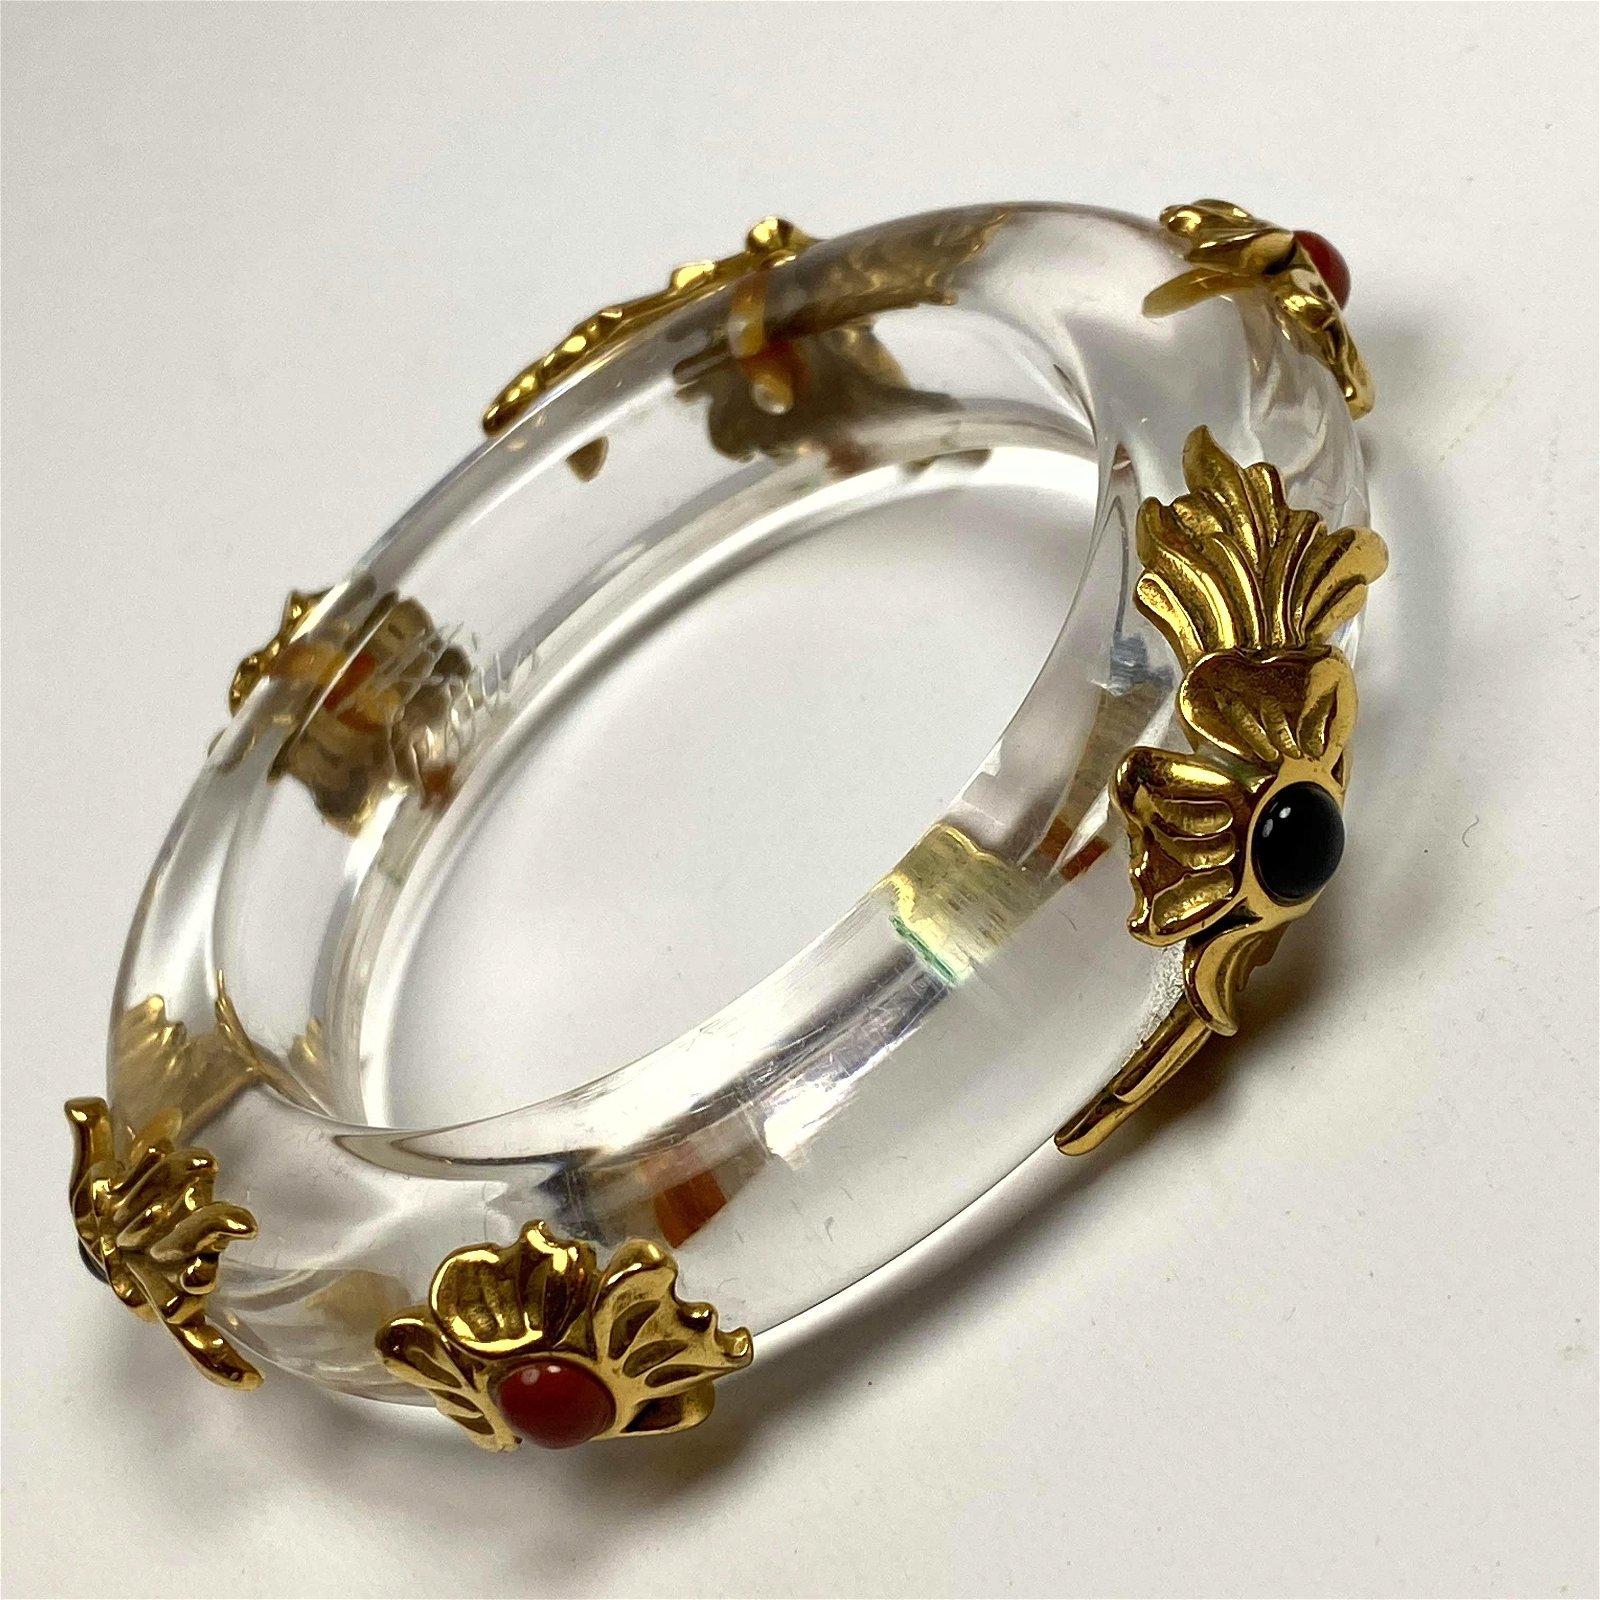 INNA CYTRINE Paris Clear Lucite Bangle Bracelet. Design